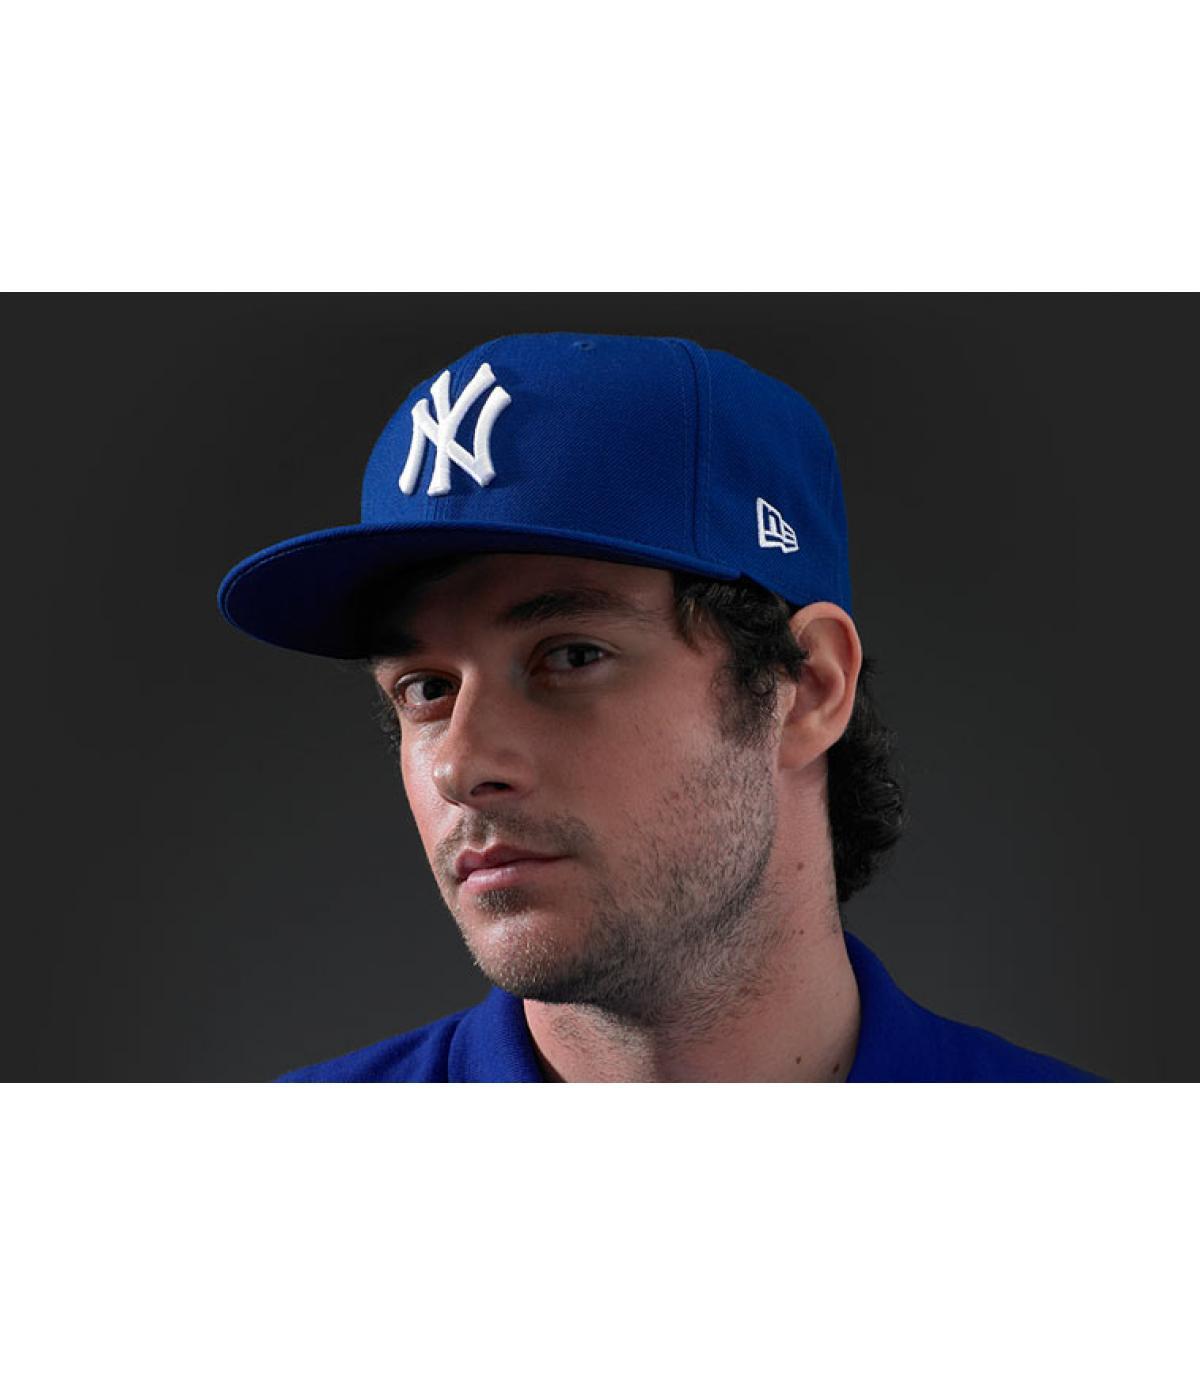 new era ny caps - MLB Basic active blue New Era - image 1 ... d1d529a1cde